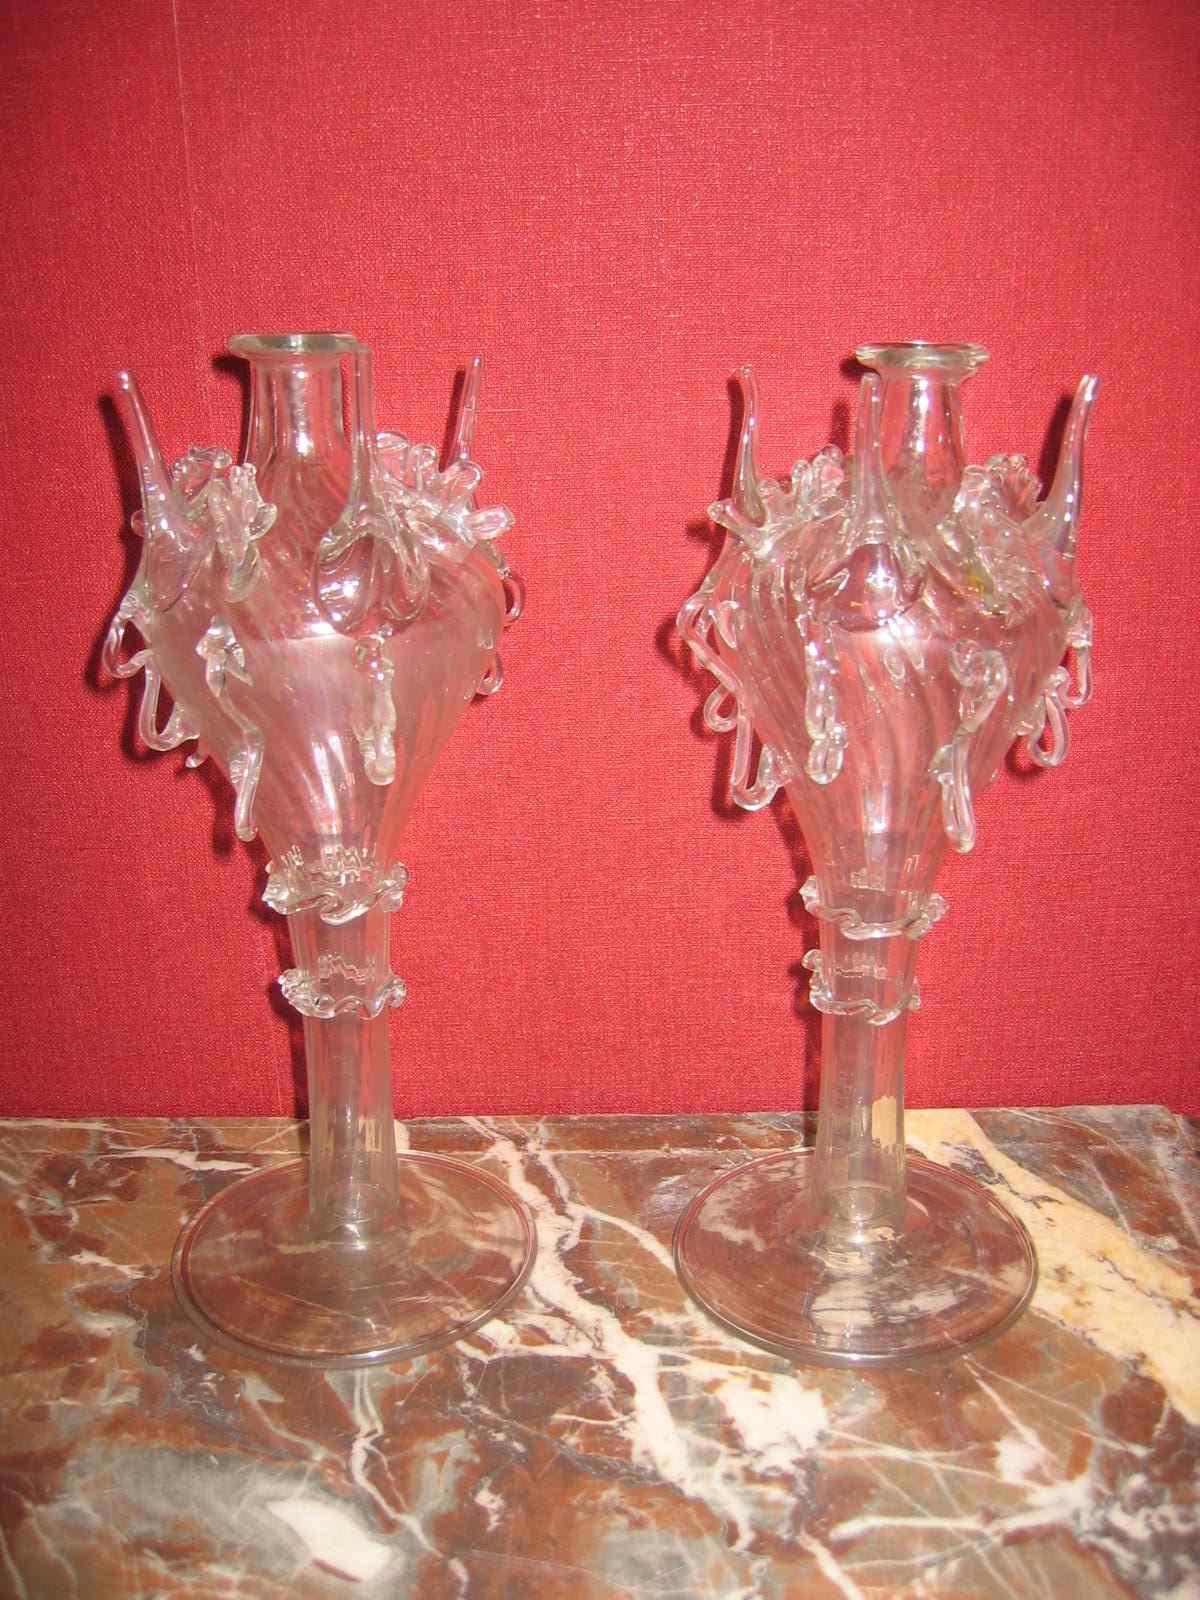 Almorratxa, rosewater sprinkler blown glass - Catal